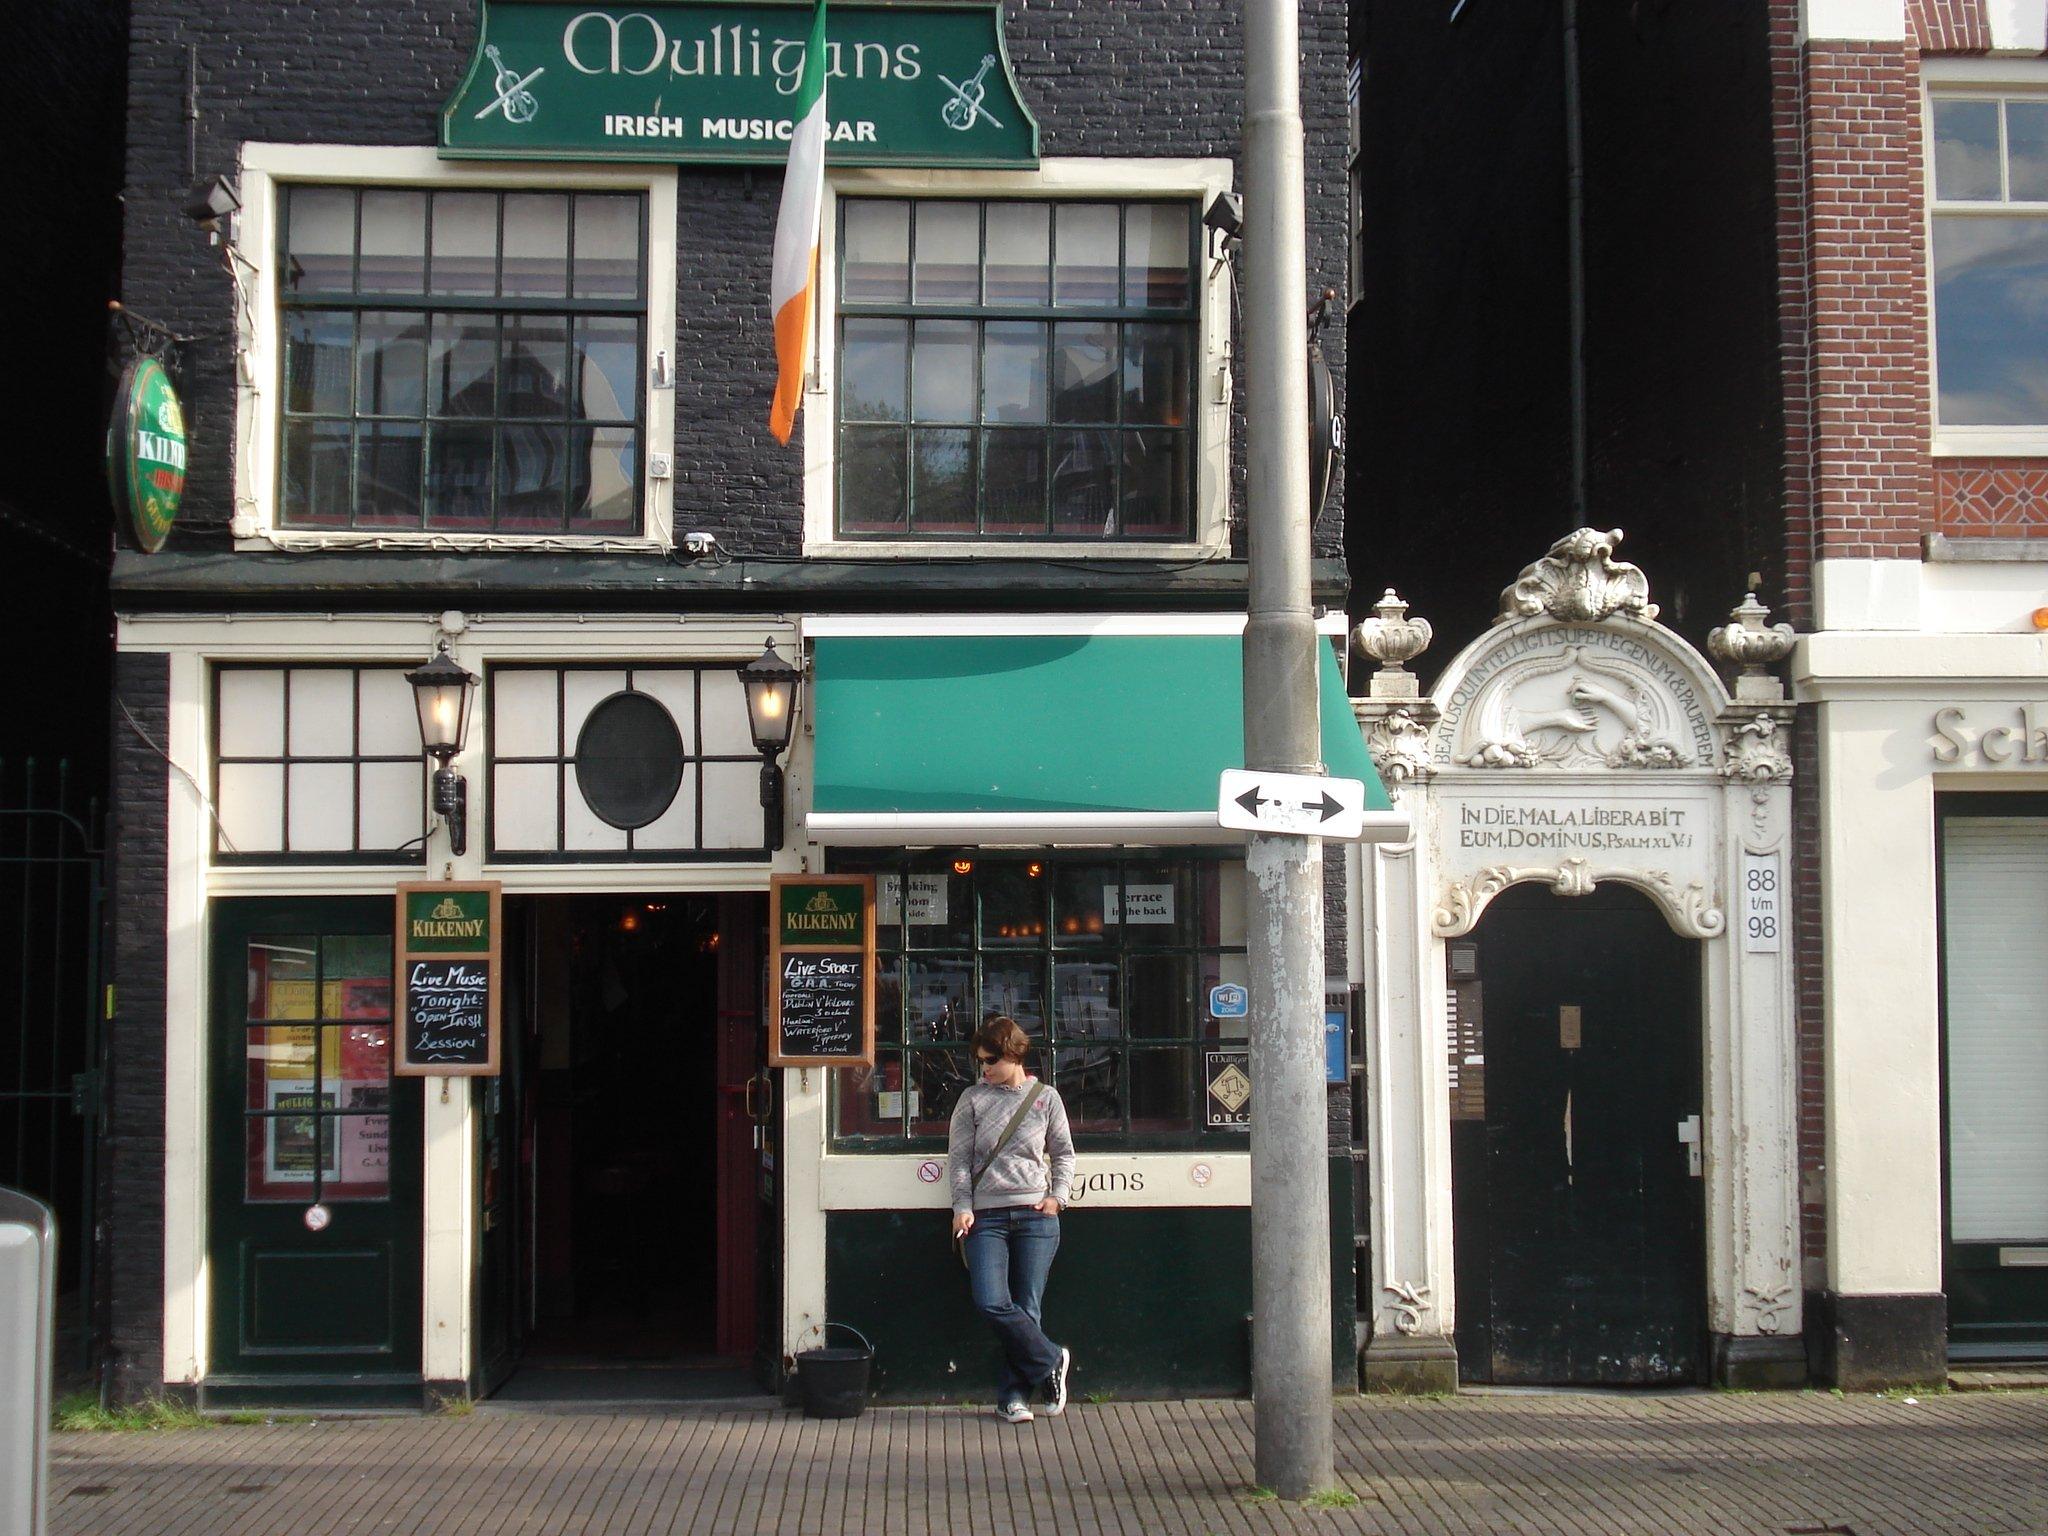 Mulligans Irish Music Bar - A'dam